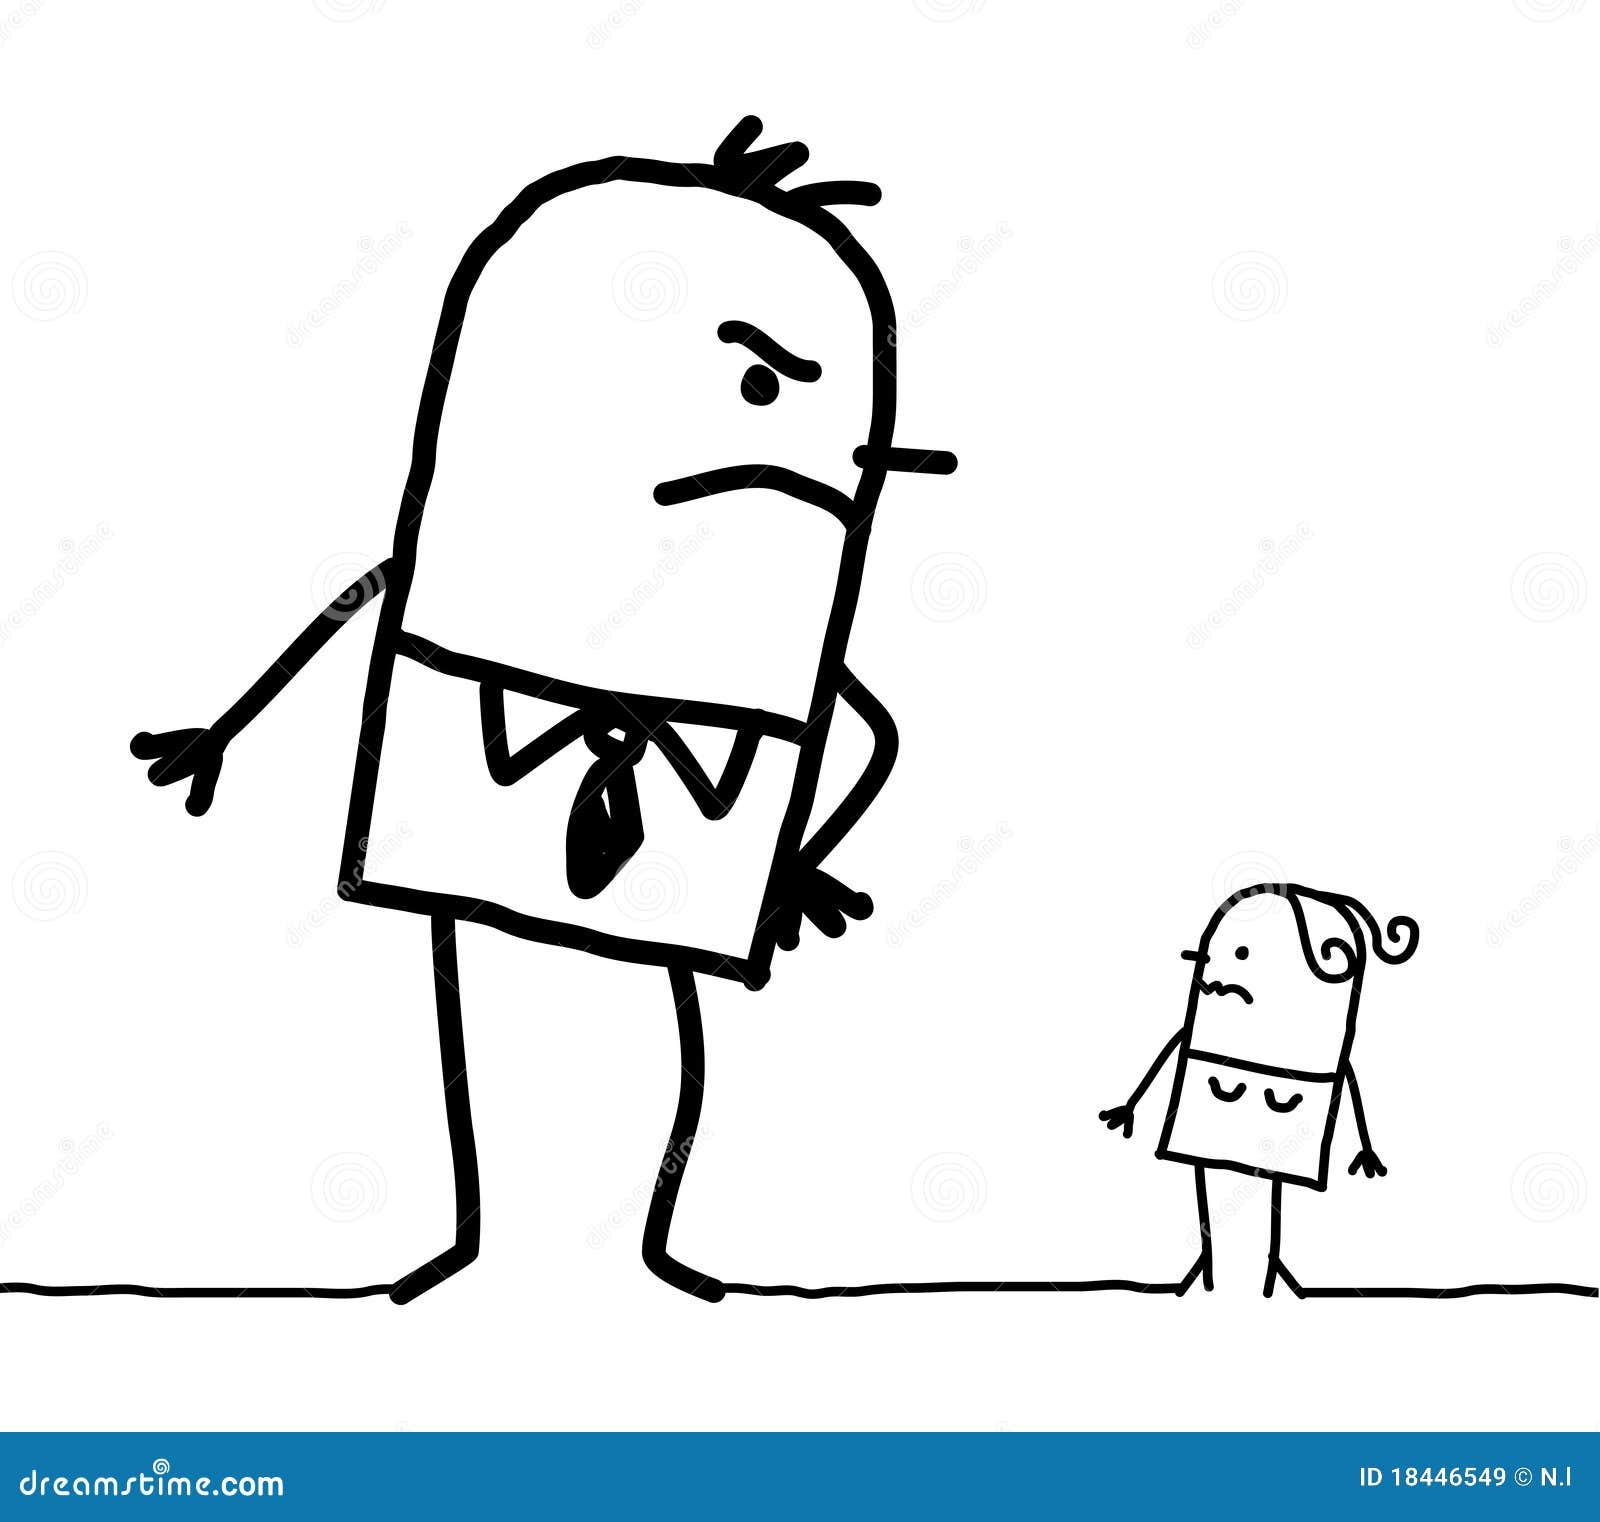 Big Man & Small Woman Royalty Free Stock Image